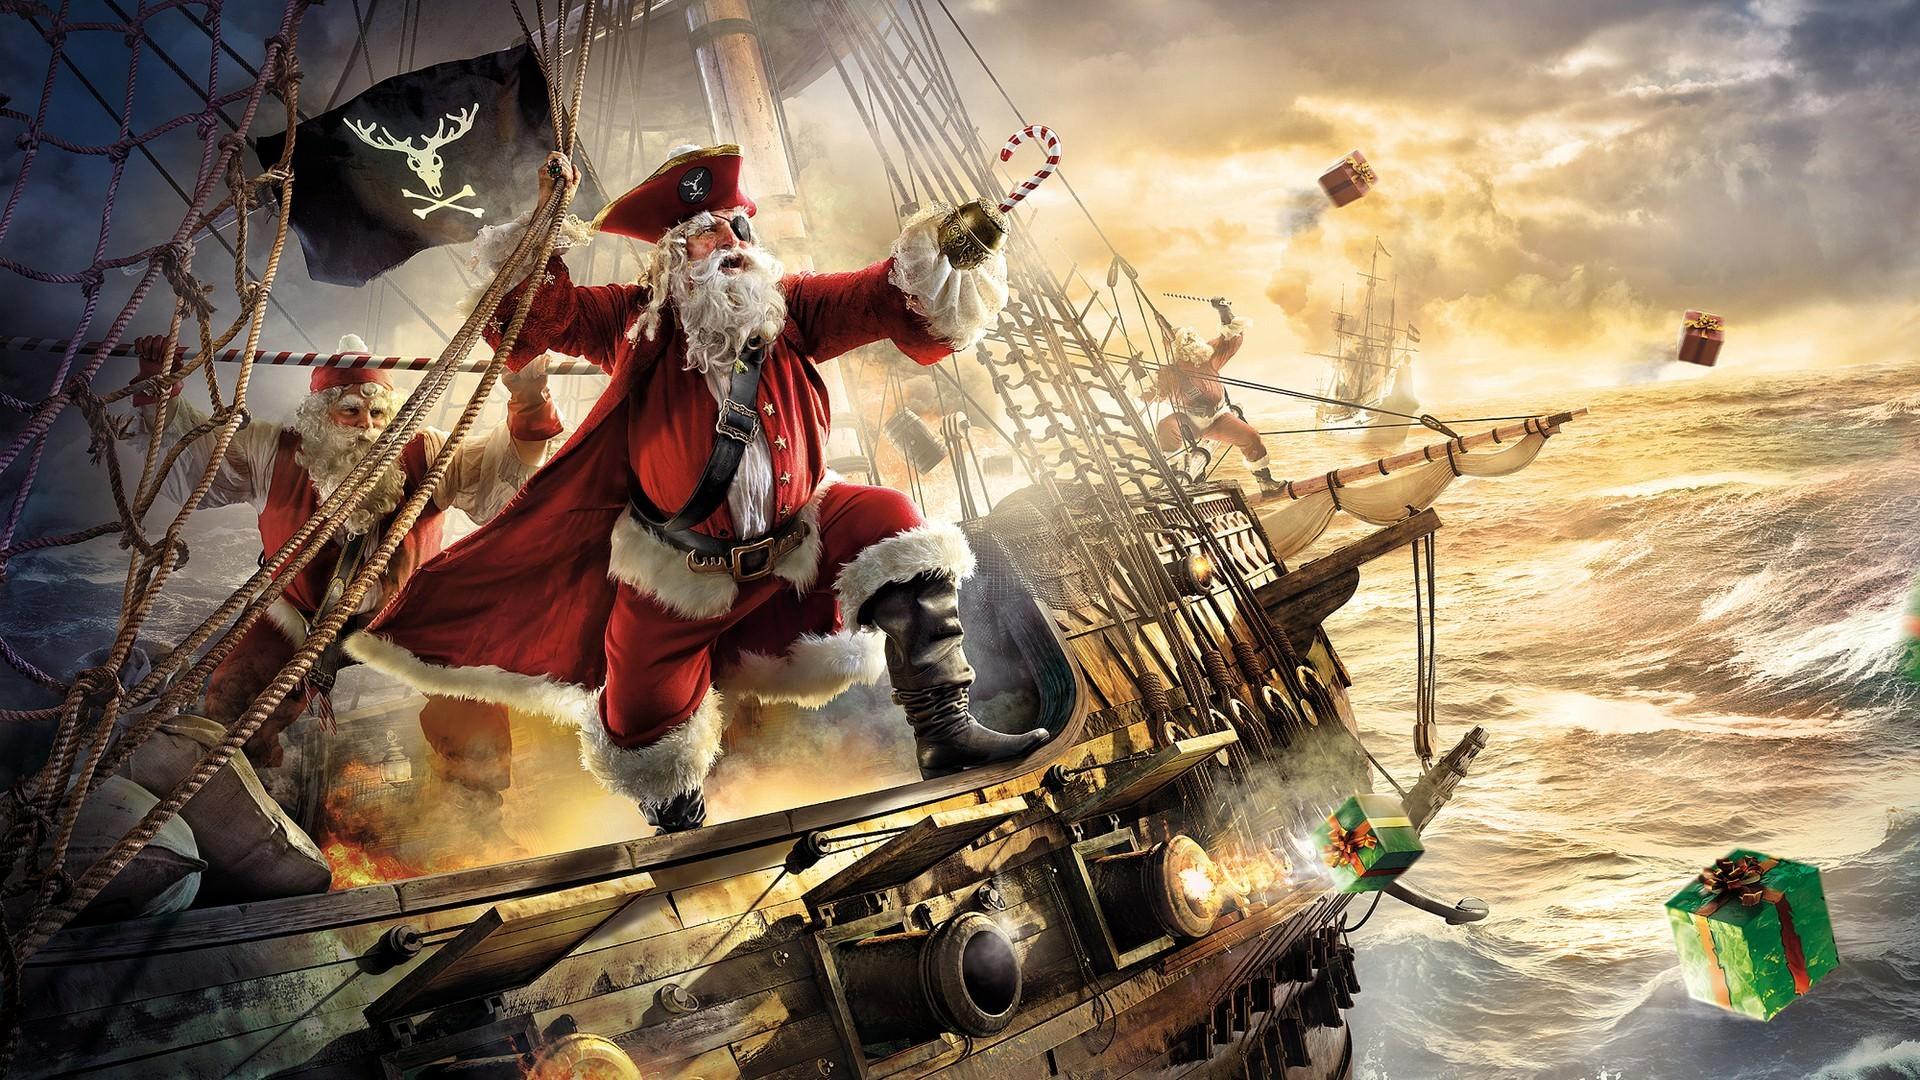 Epic Pirate Santa Clause Christmas Wallpaper